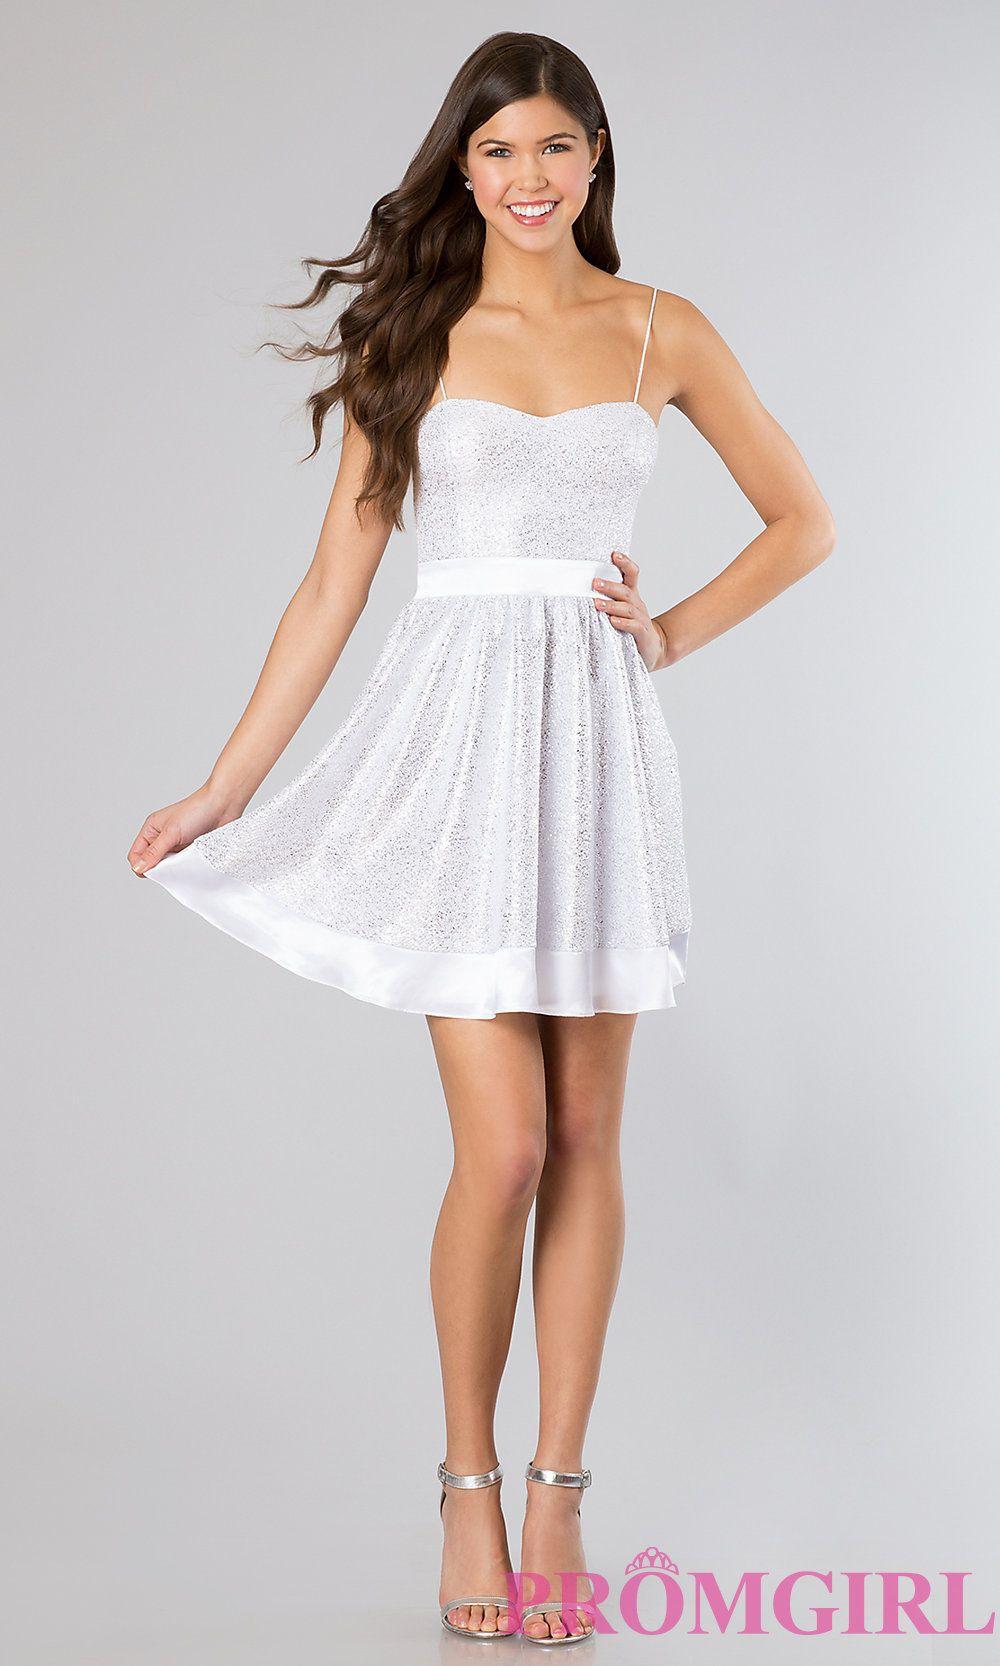 Prom Dresses, Plus Size Dresses, Prom Shoes -PromGirl : Short ...